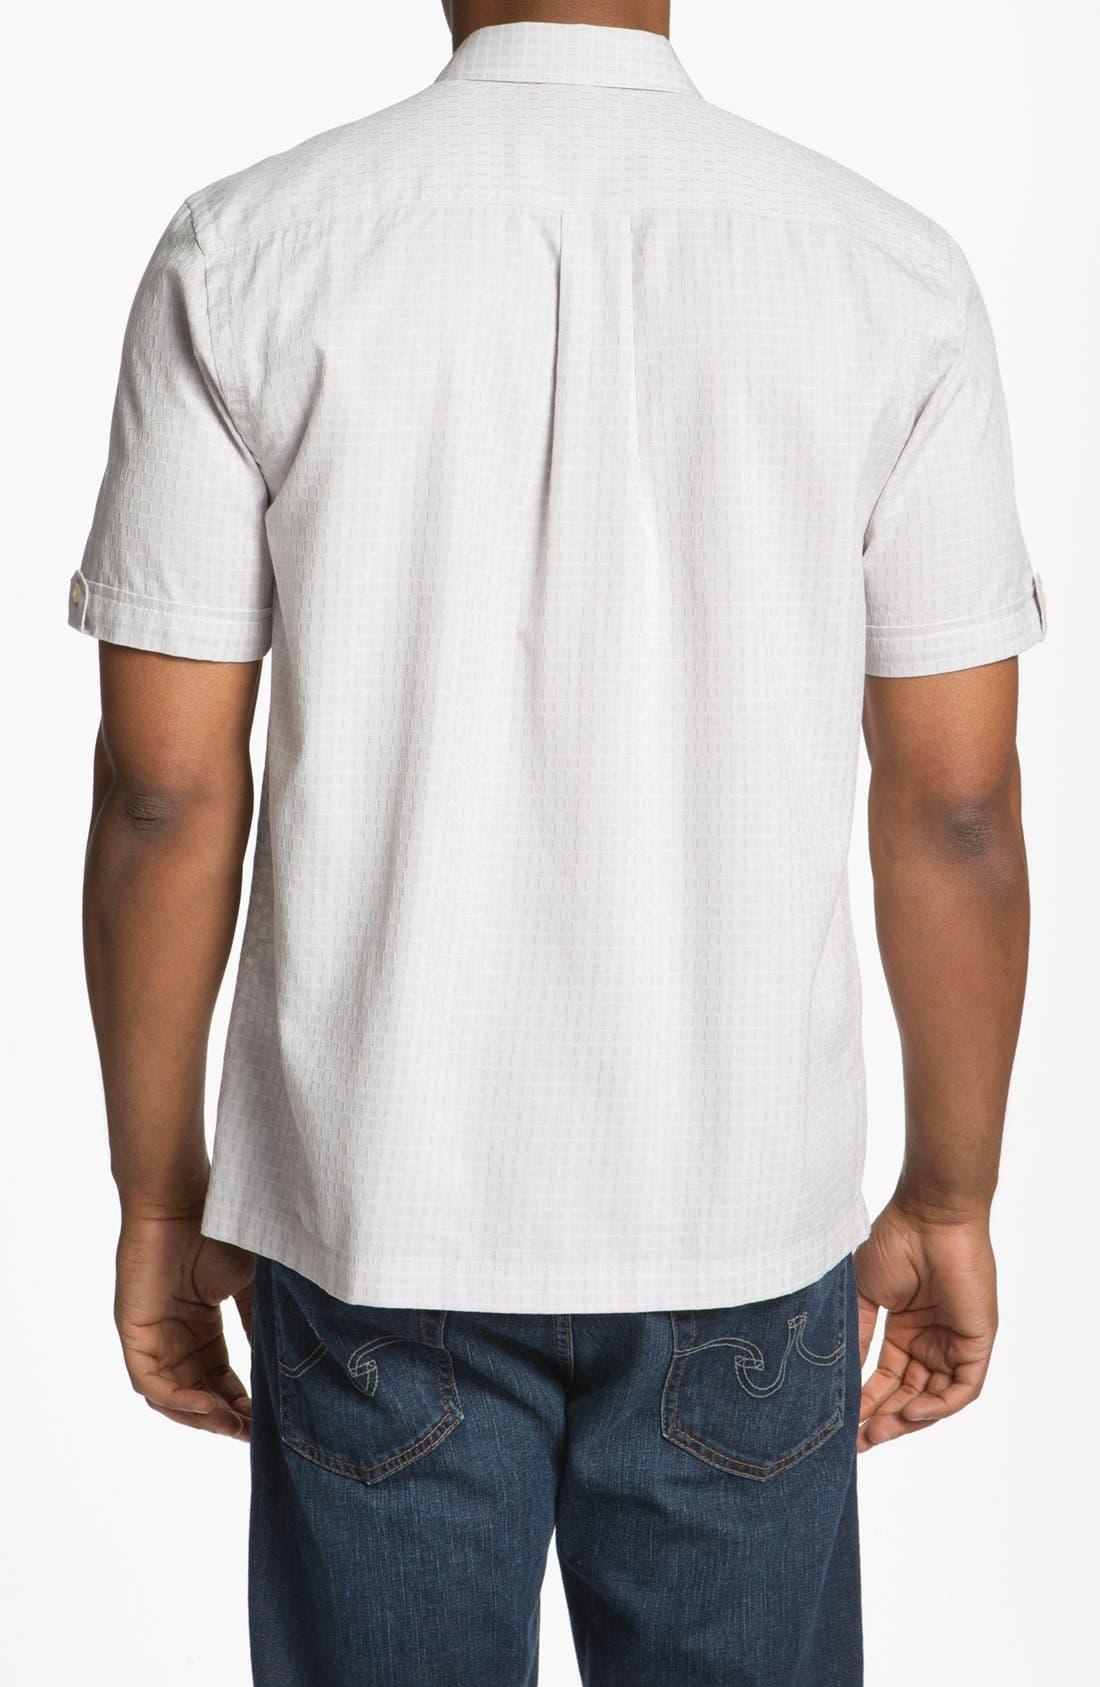 Alternate Image 2  - Tommy Bahama 'Sound Wave' Silk Blend Campshirt